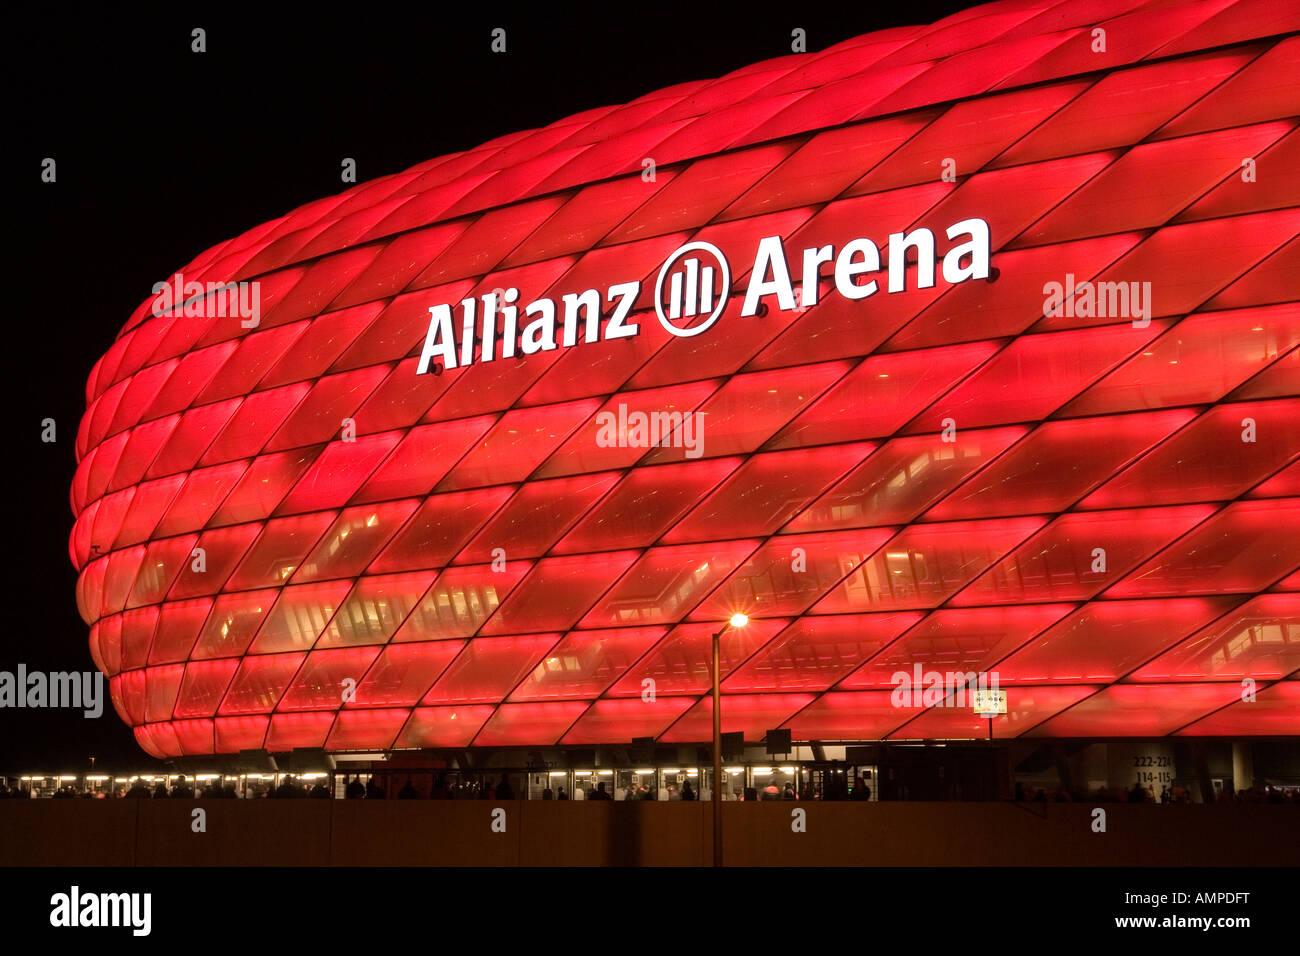 EU DE Germany Bavaria Munich The illuminated football stadion Allianz Arena at night game for UEFA Pokal at 08 11 - Stock Image